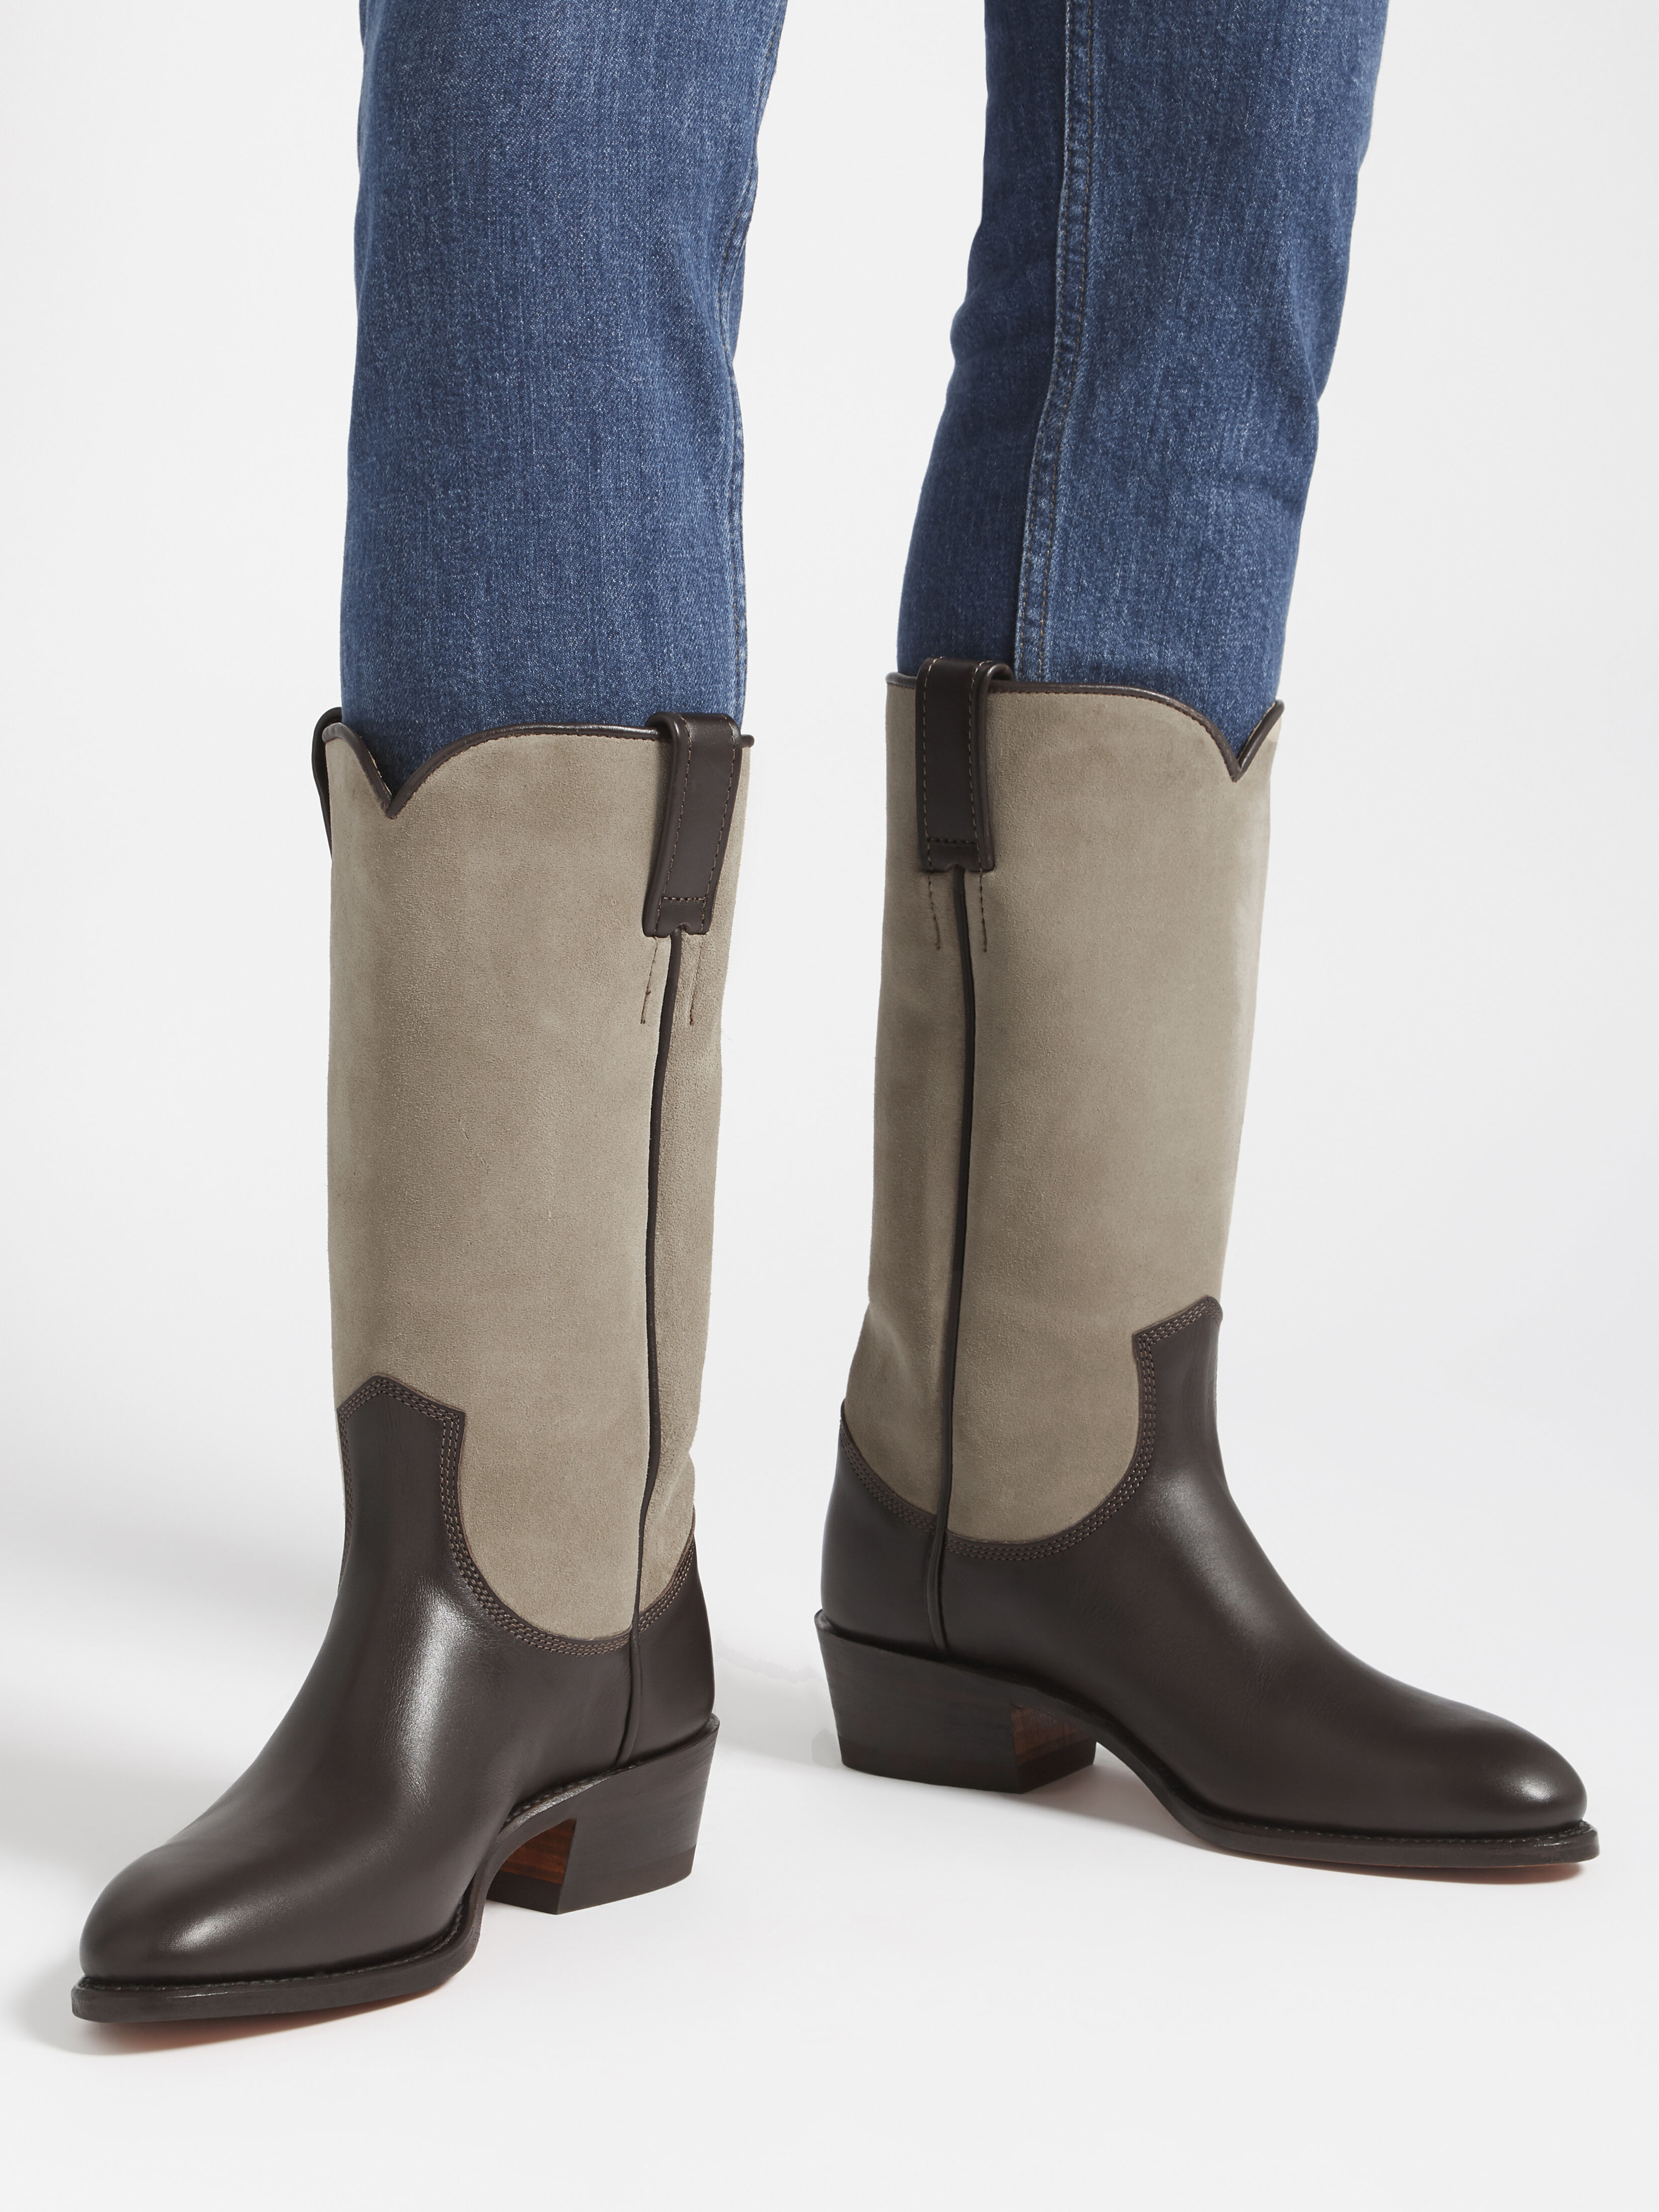 Authentic Bronc Top boot - Men's Boots